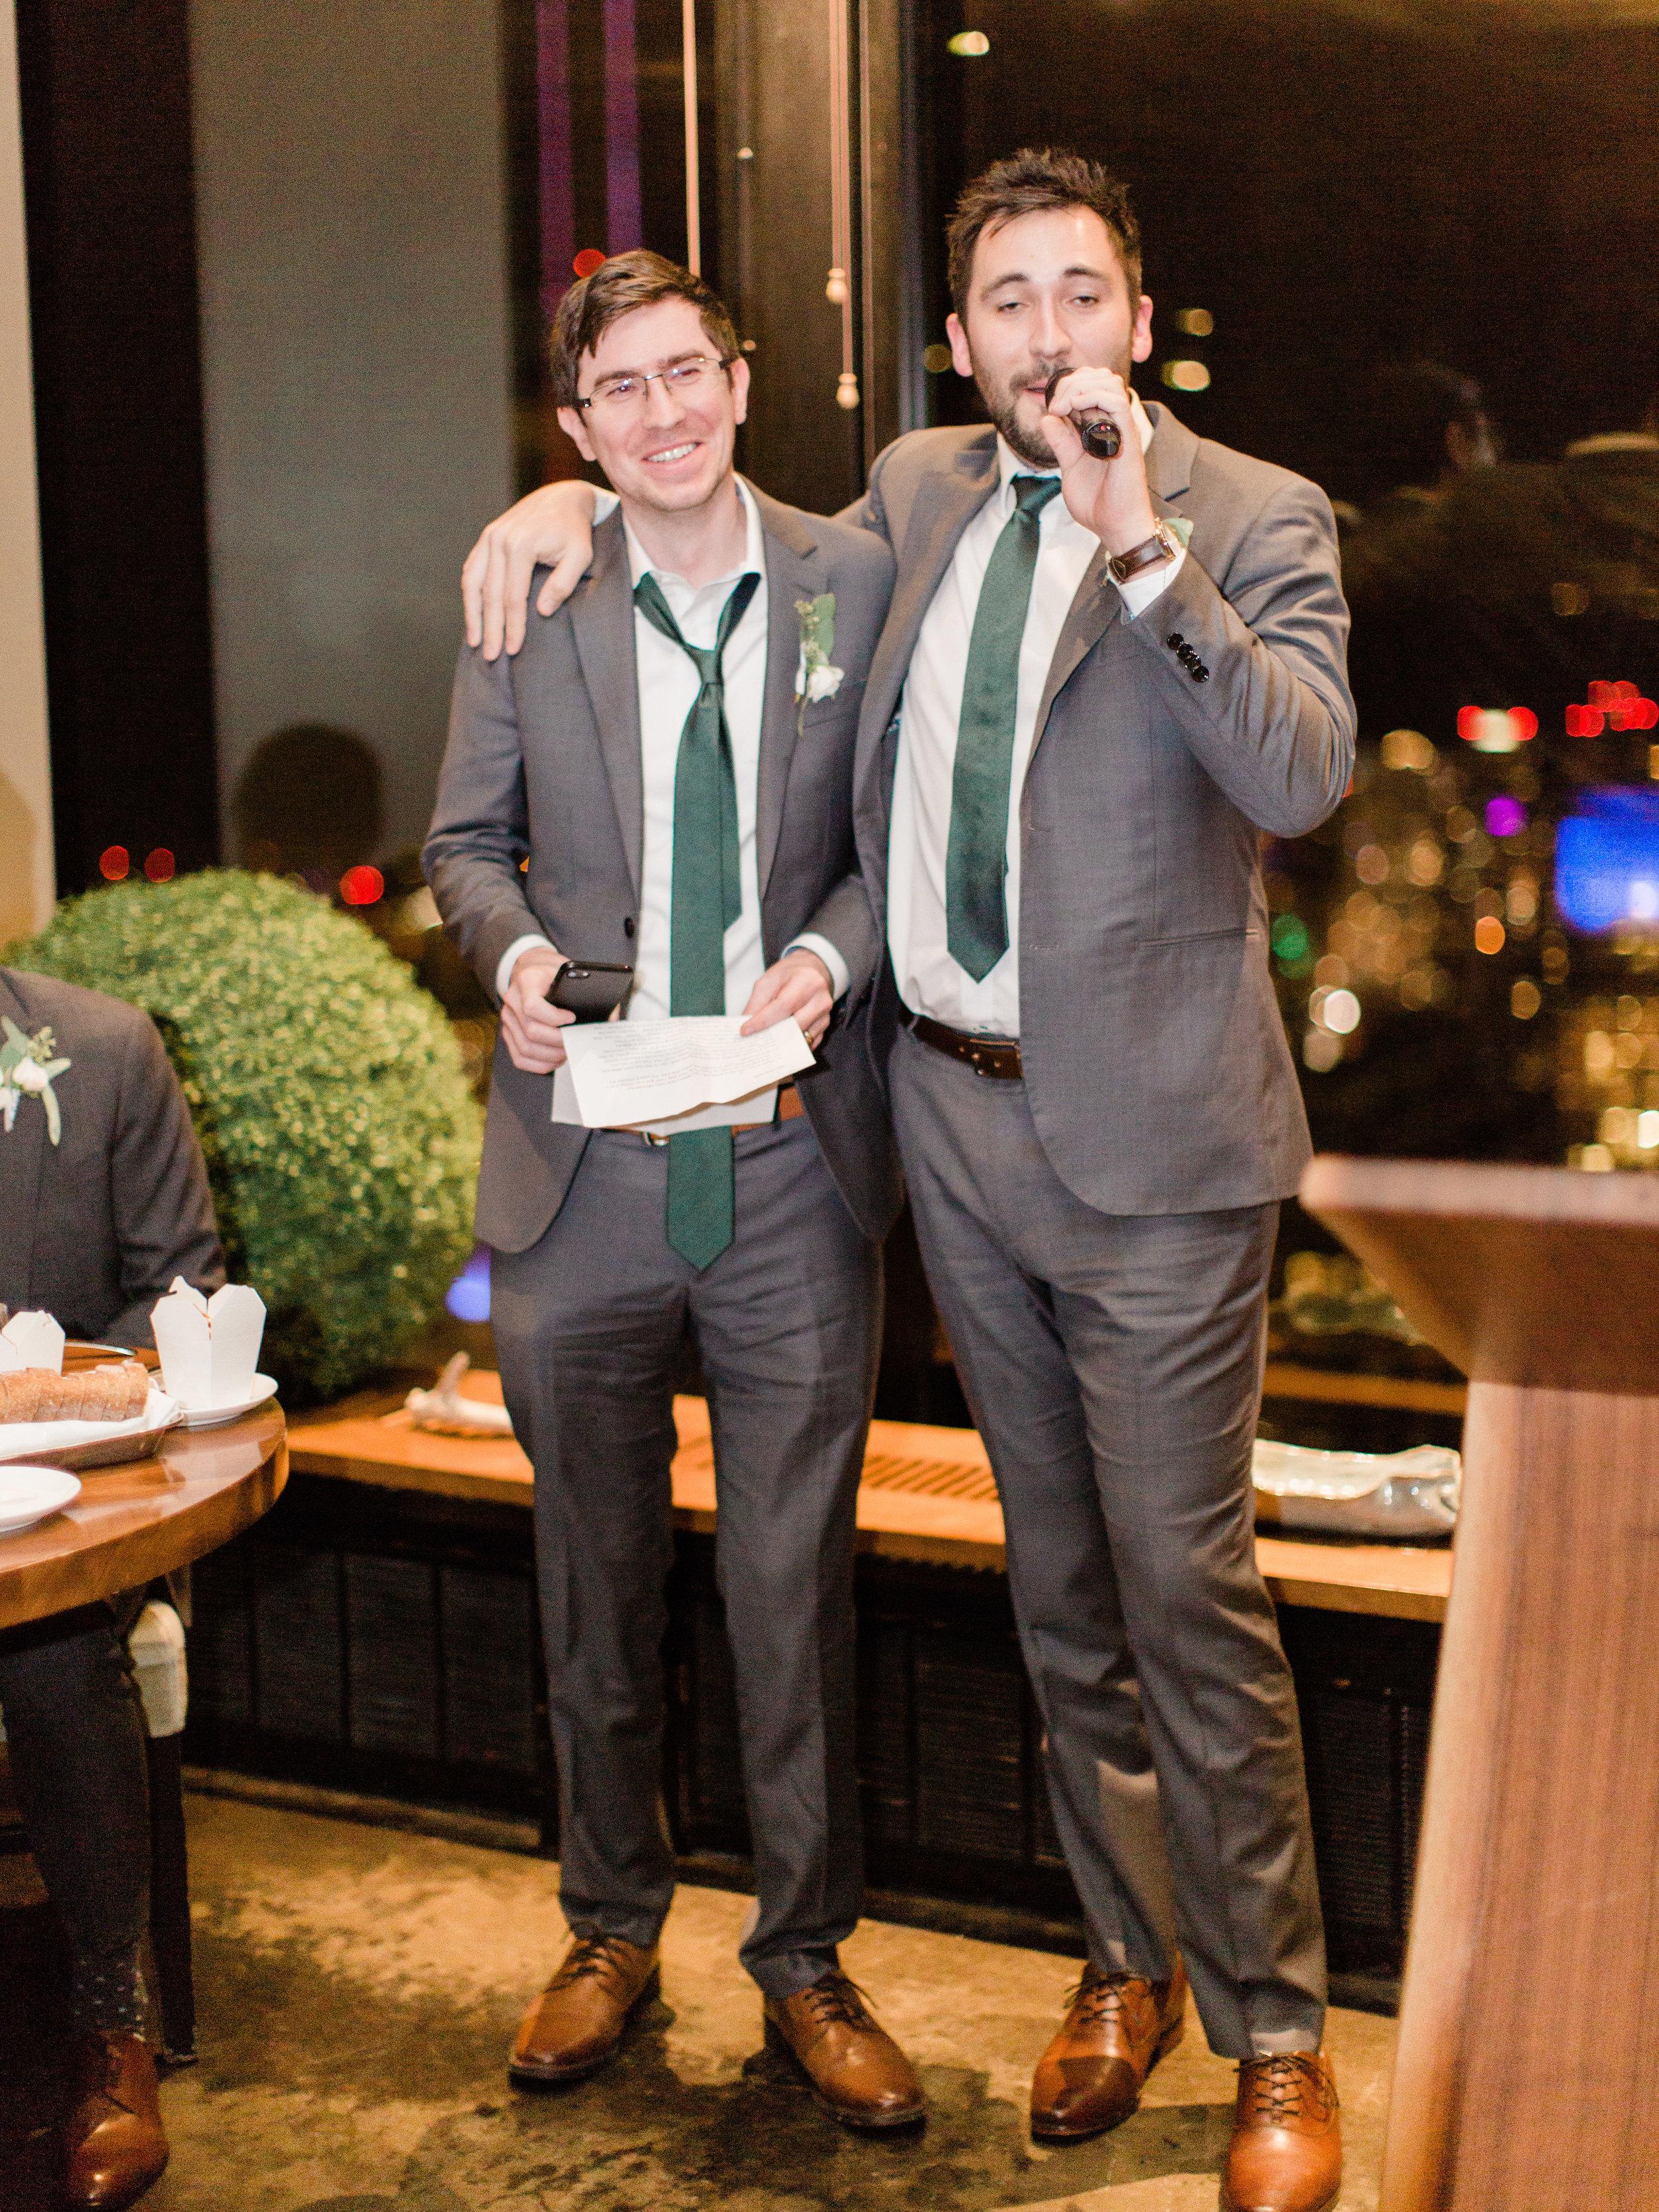 Toronto-wedding-photographer-downtown-winter-wedding-intimate-restaurant-canoe179.jpg